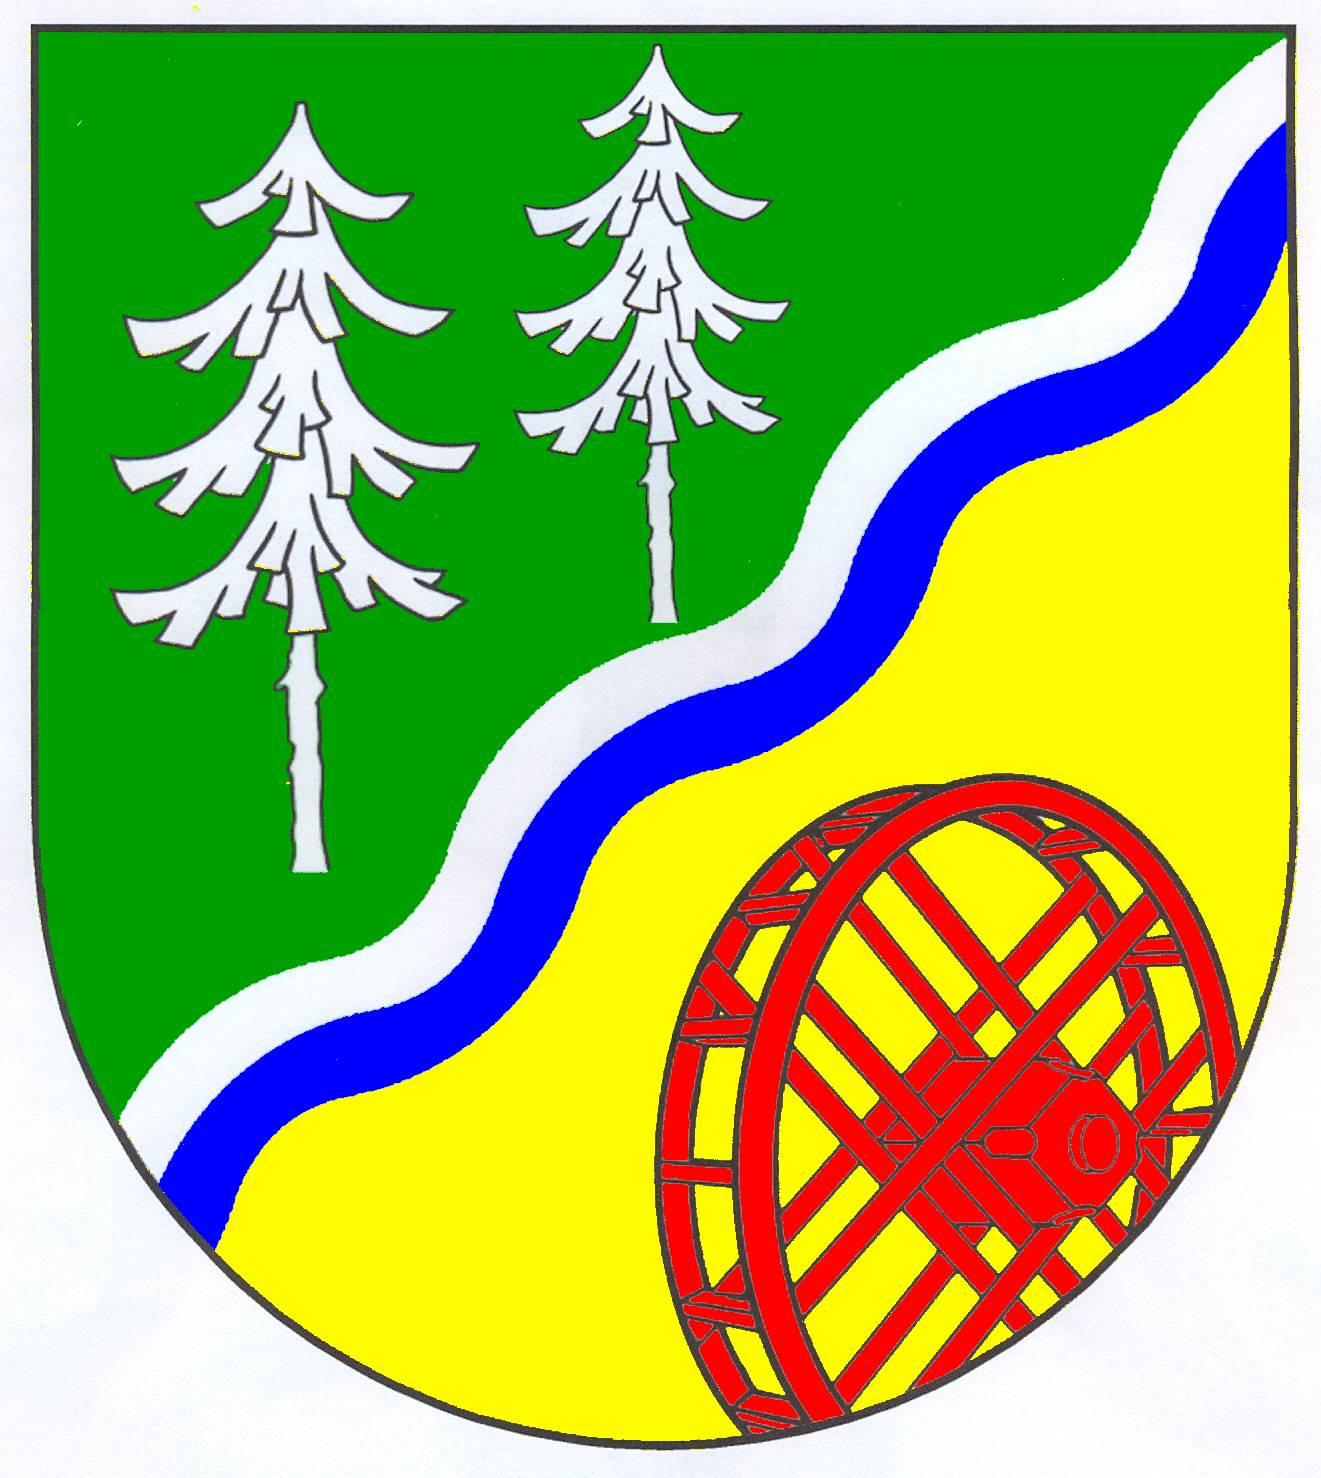 Wappen GemeindeGrande, Kreis Stormarn